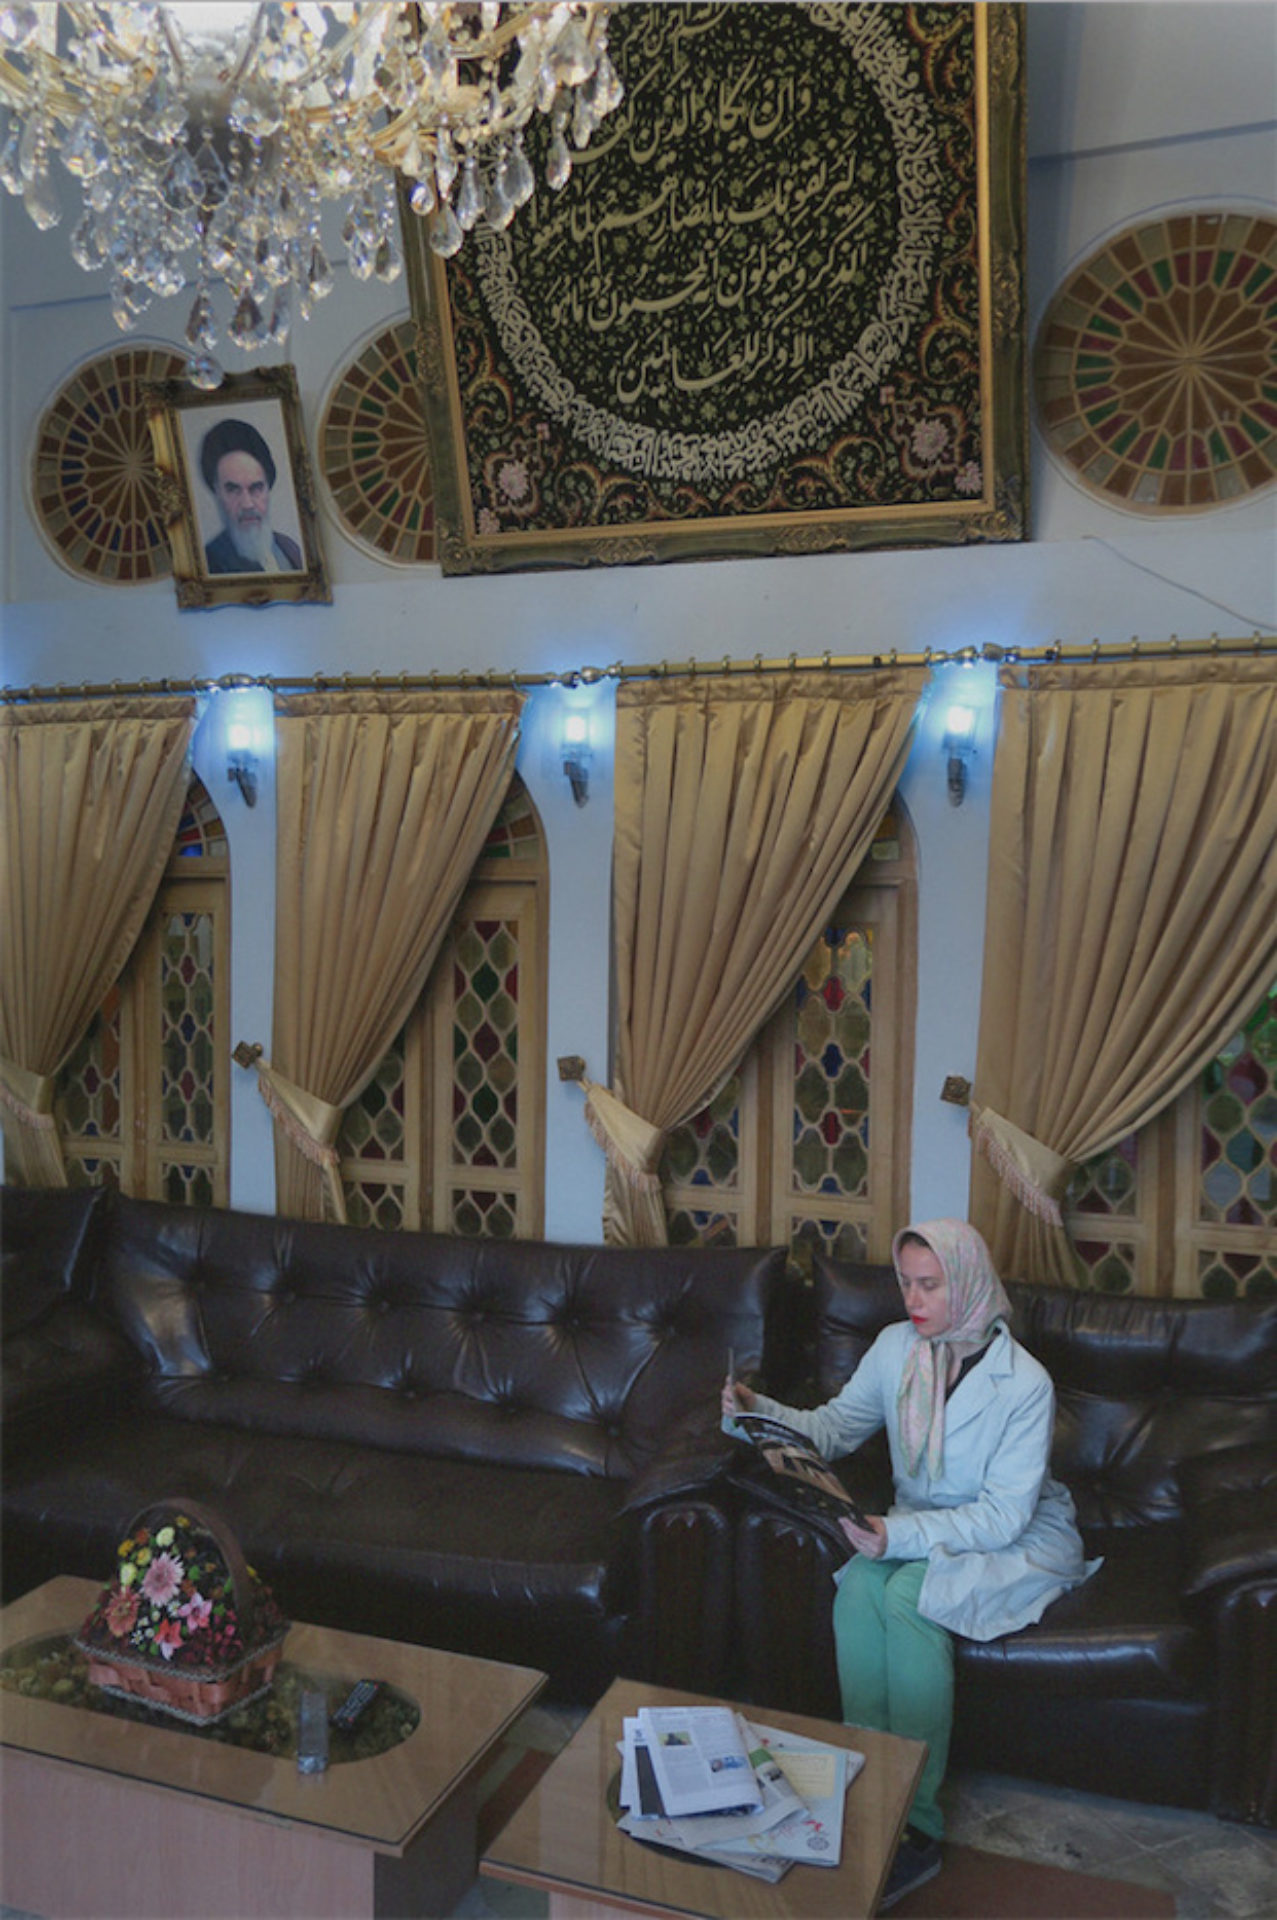 Aneta Grzeszykowska, Iranian Filmstills, 2015, #55